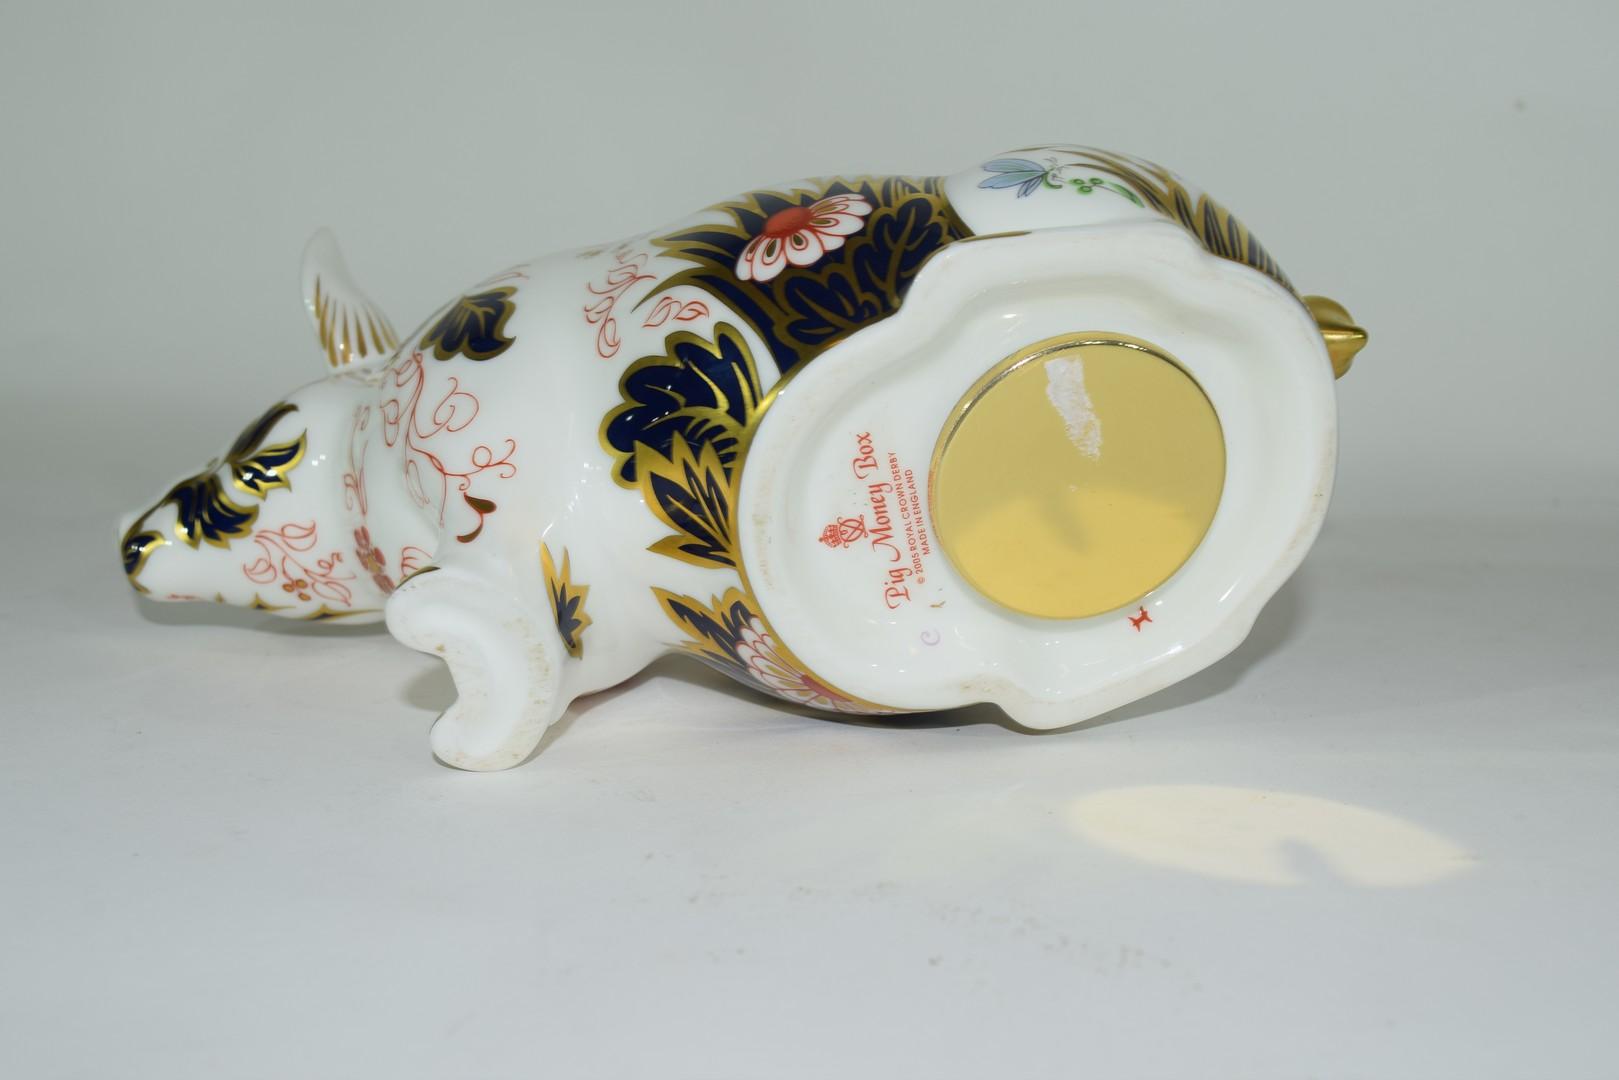 Large Royal Crown Derby pig money box - Image 5 of 5